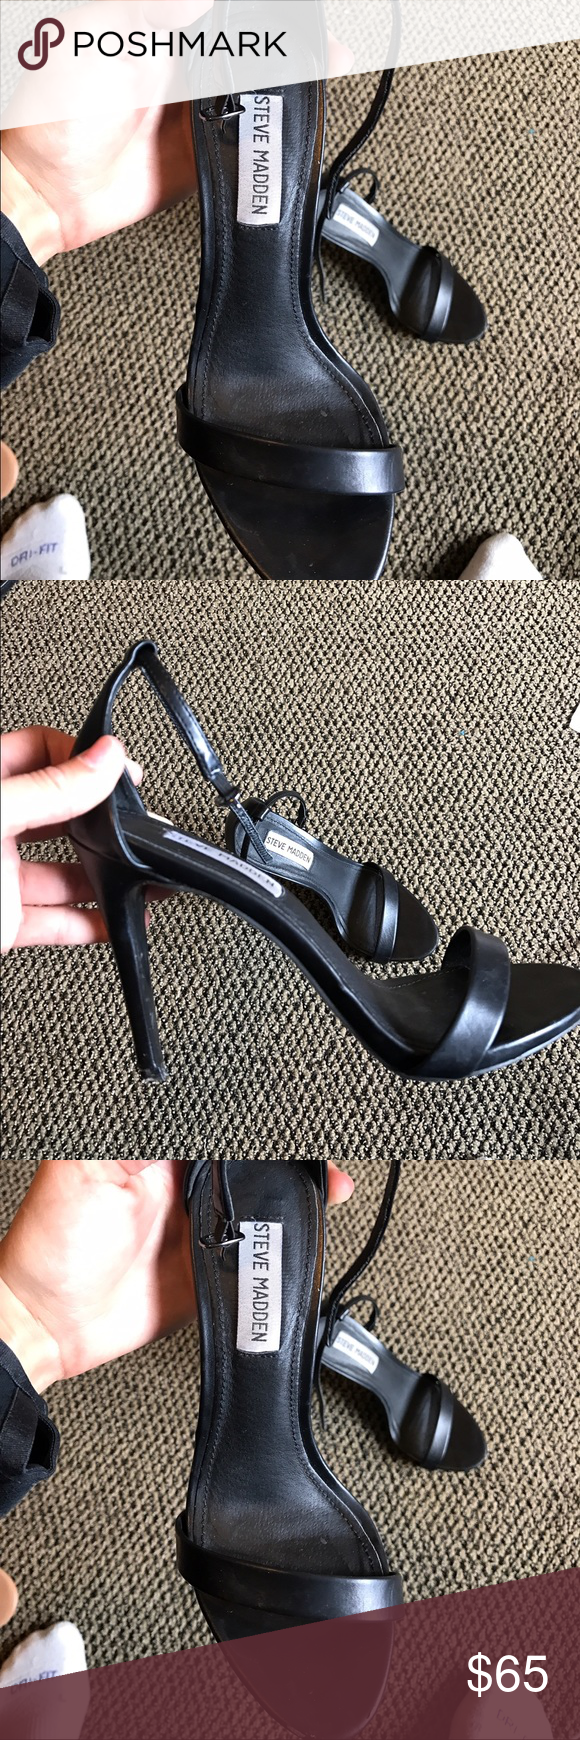 Steve Madden Stecy Heel Size women's 7, black leather. Worn 4 times. Steve Madden Shoes Heels